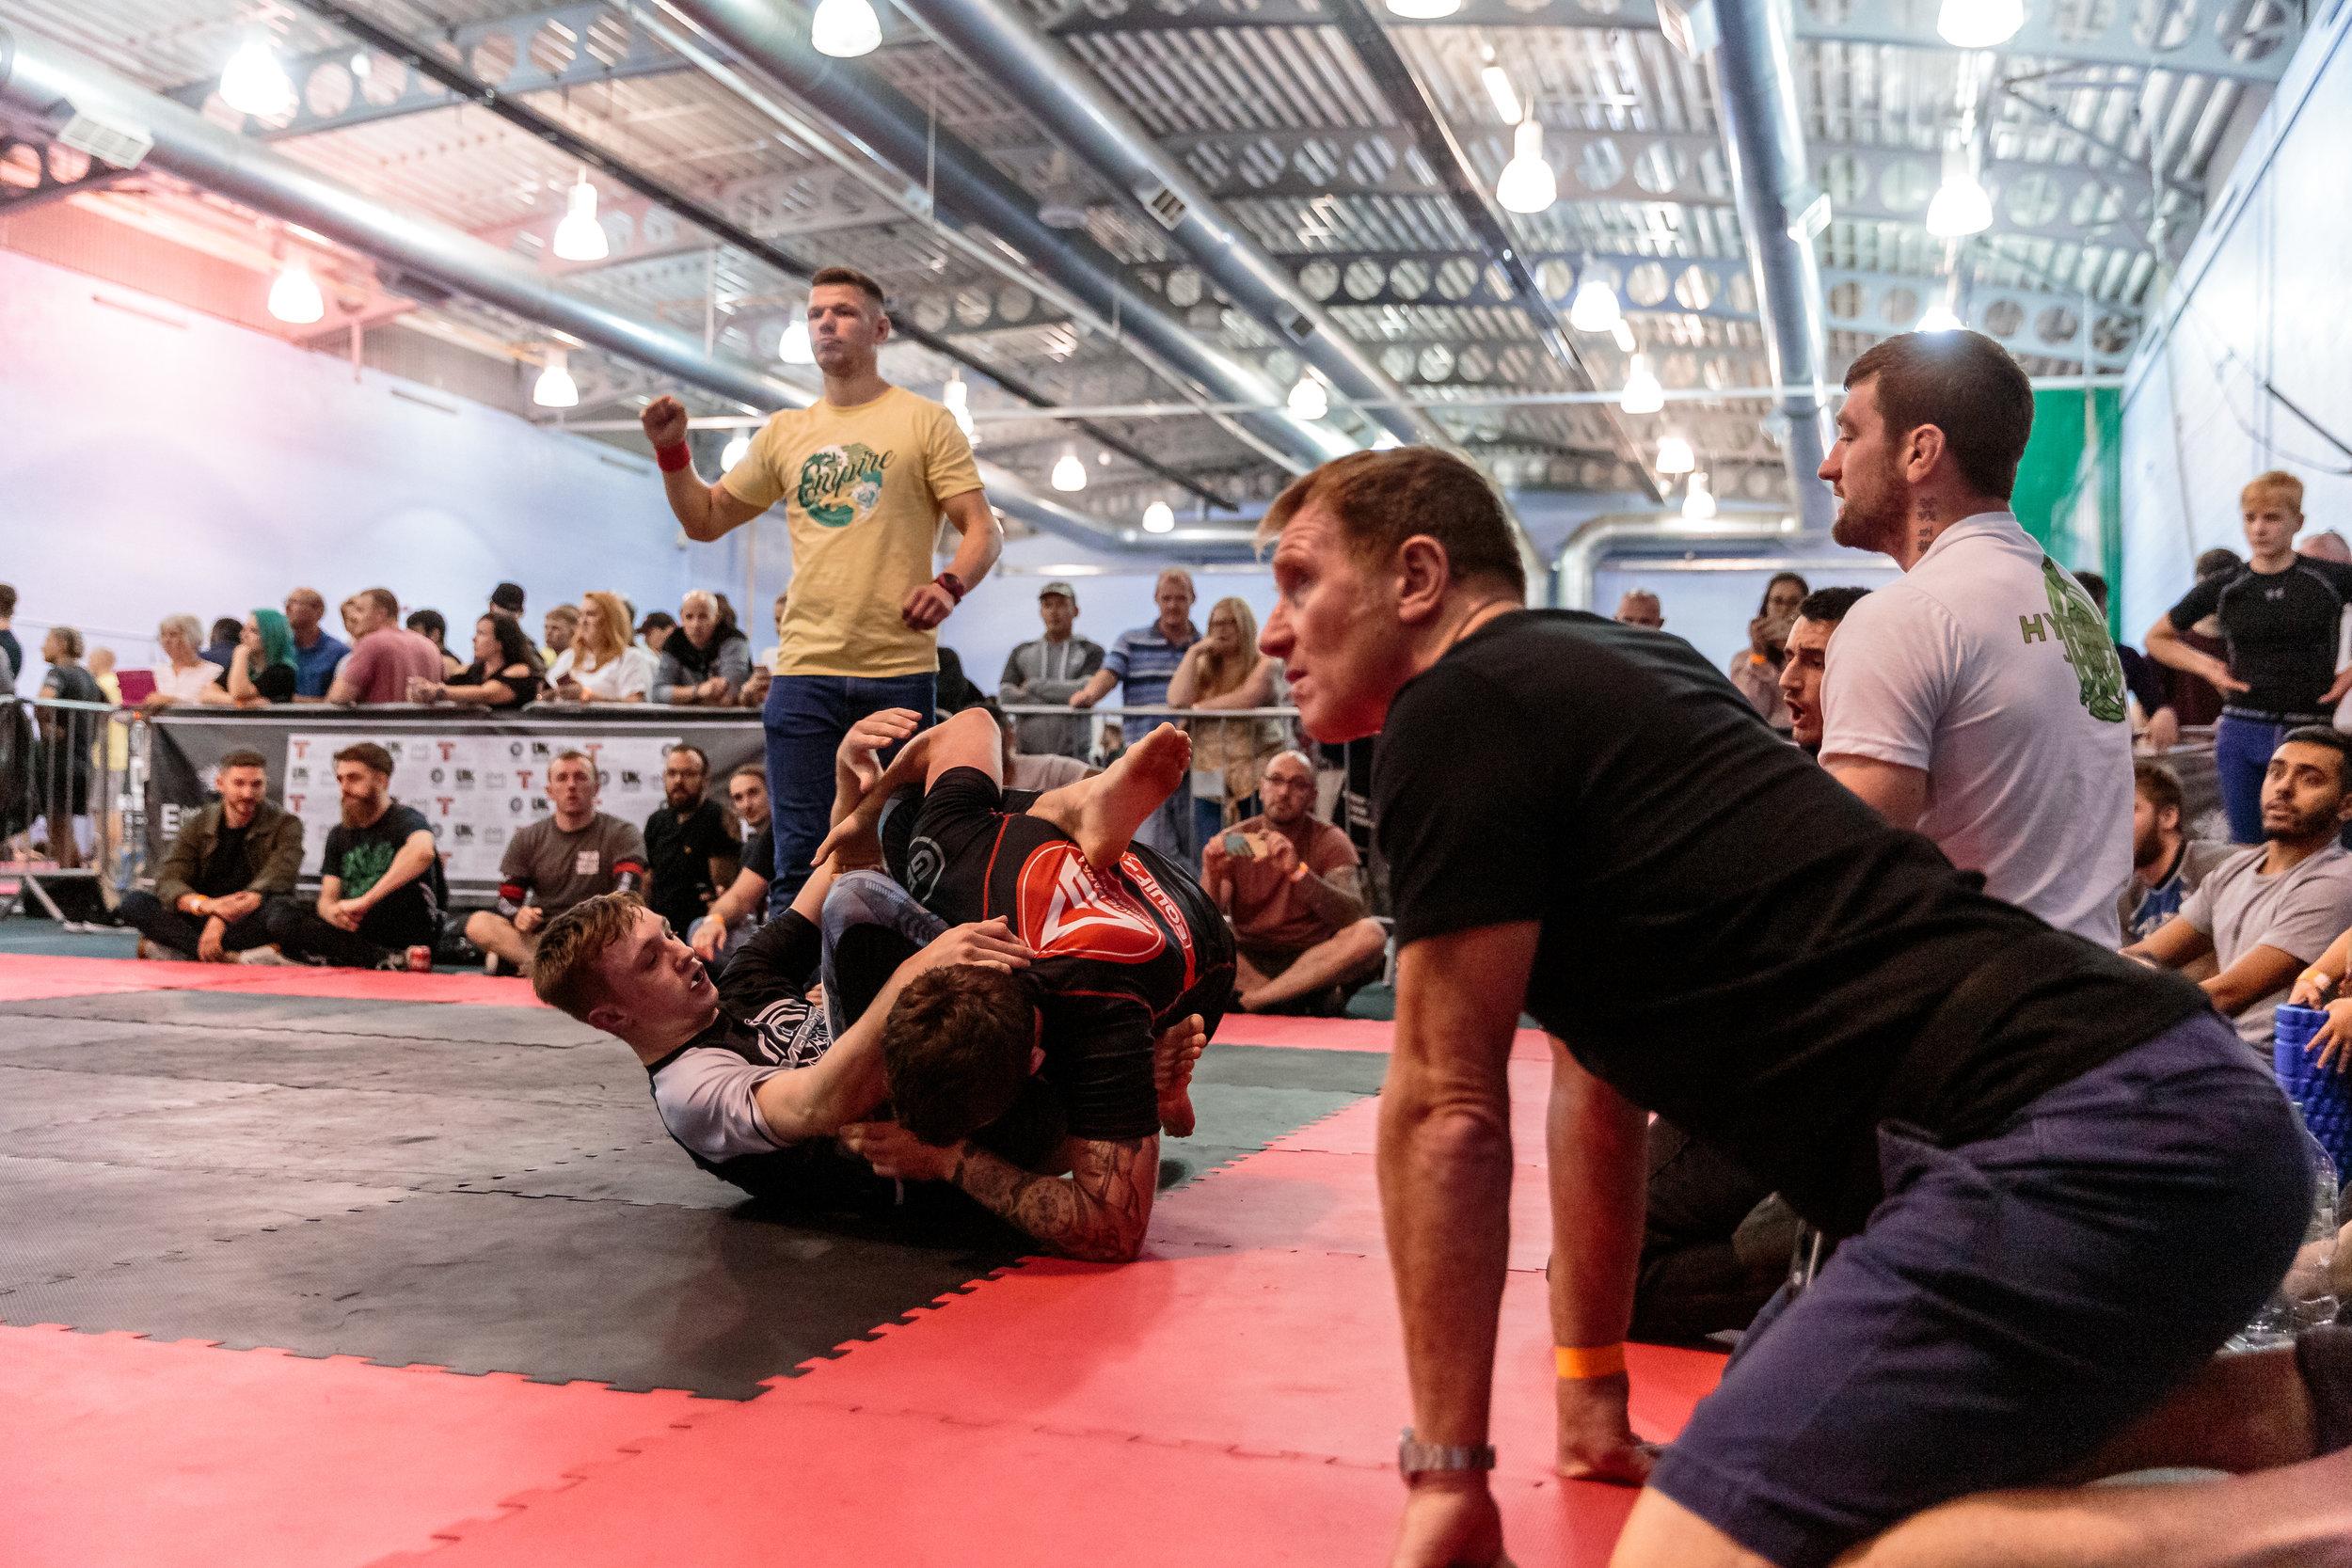 Hayden Baldwin vs Michael Wright at Empire Grappling 11 Yorkshire Open - August 2019